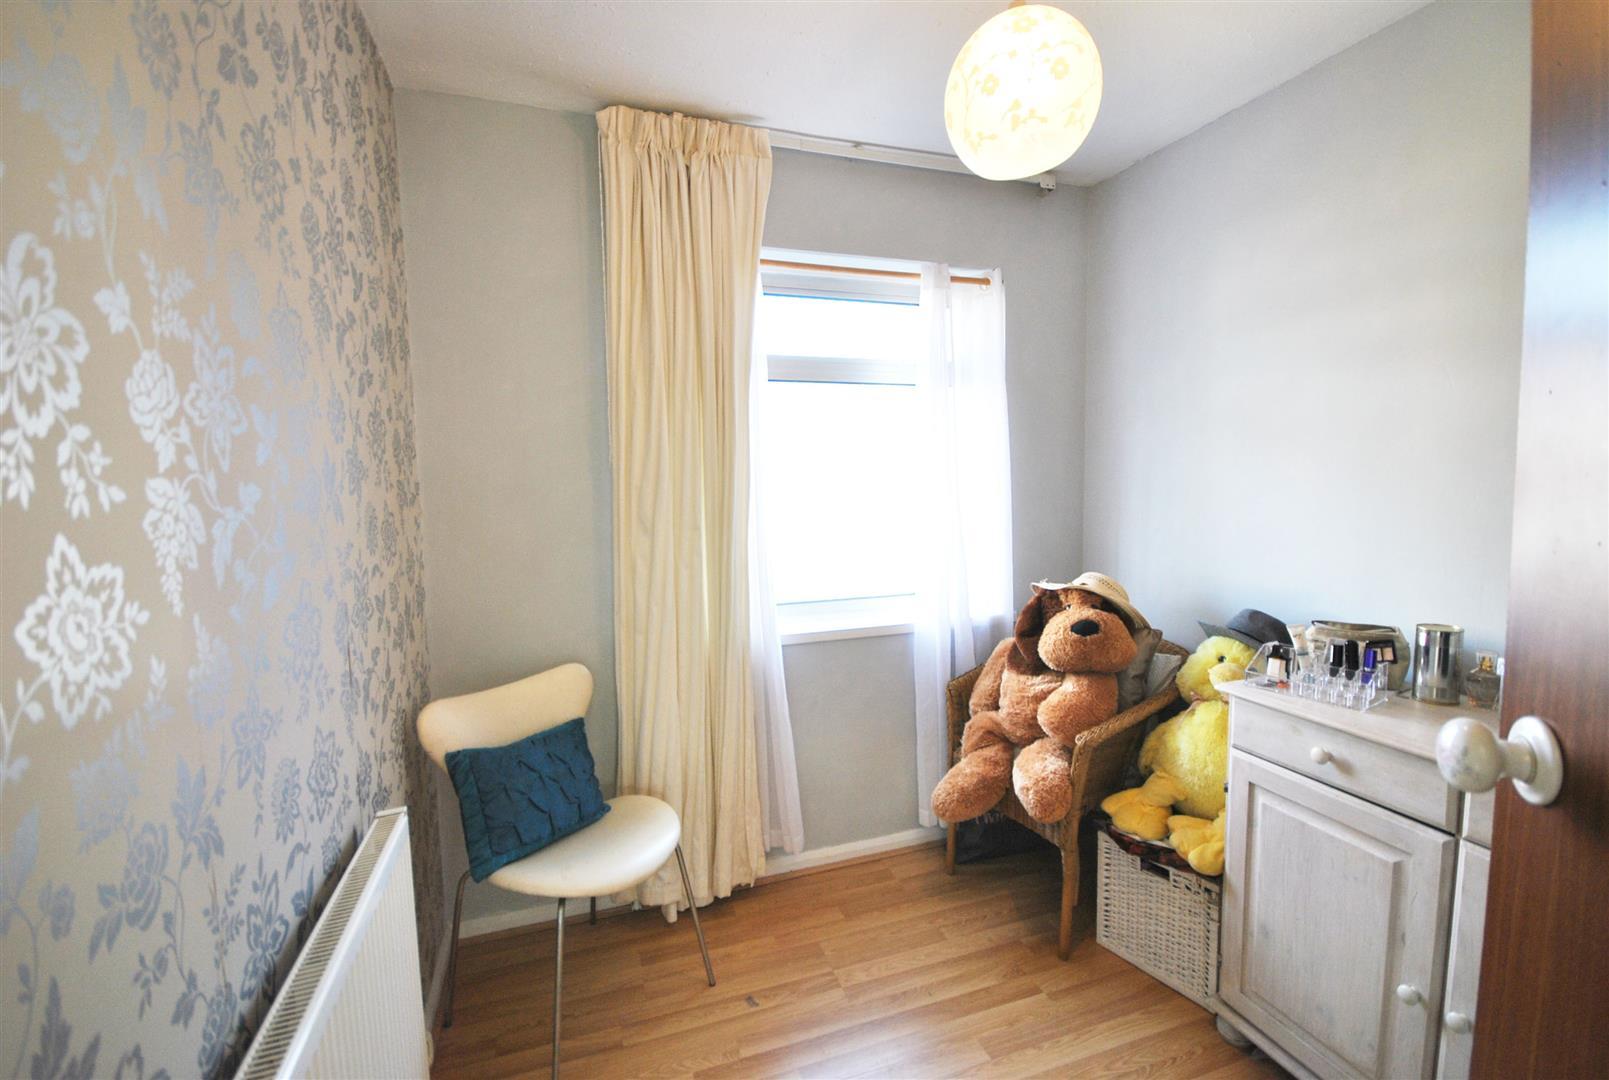 3 Bedrooms, House - Semi-Detached